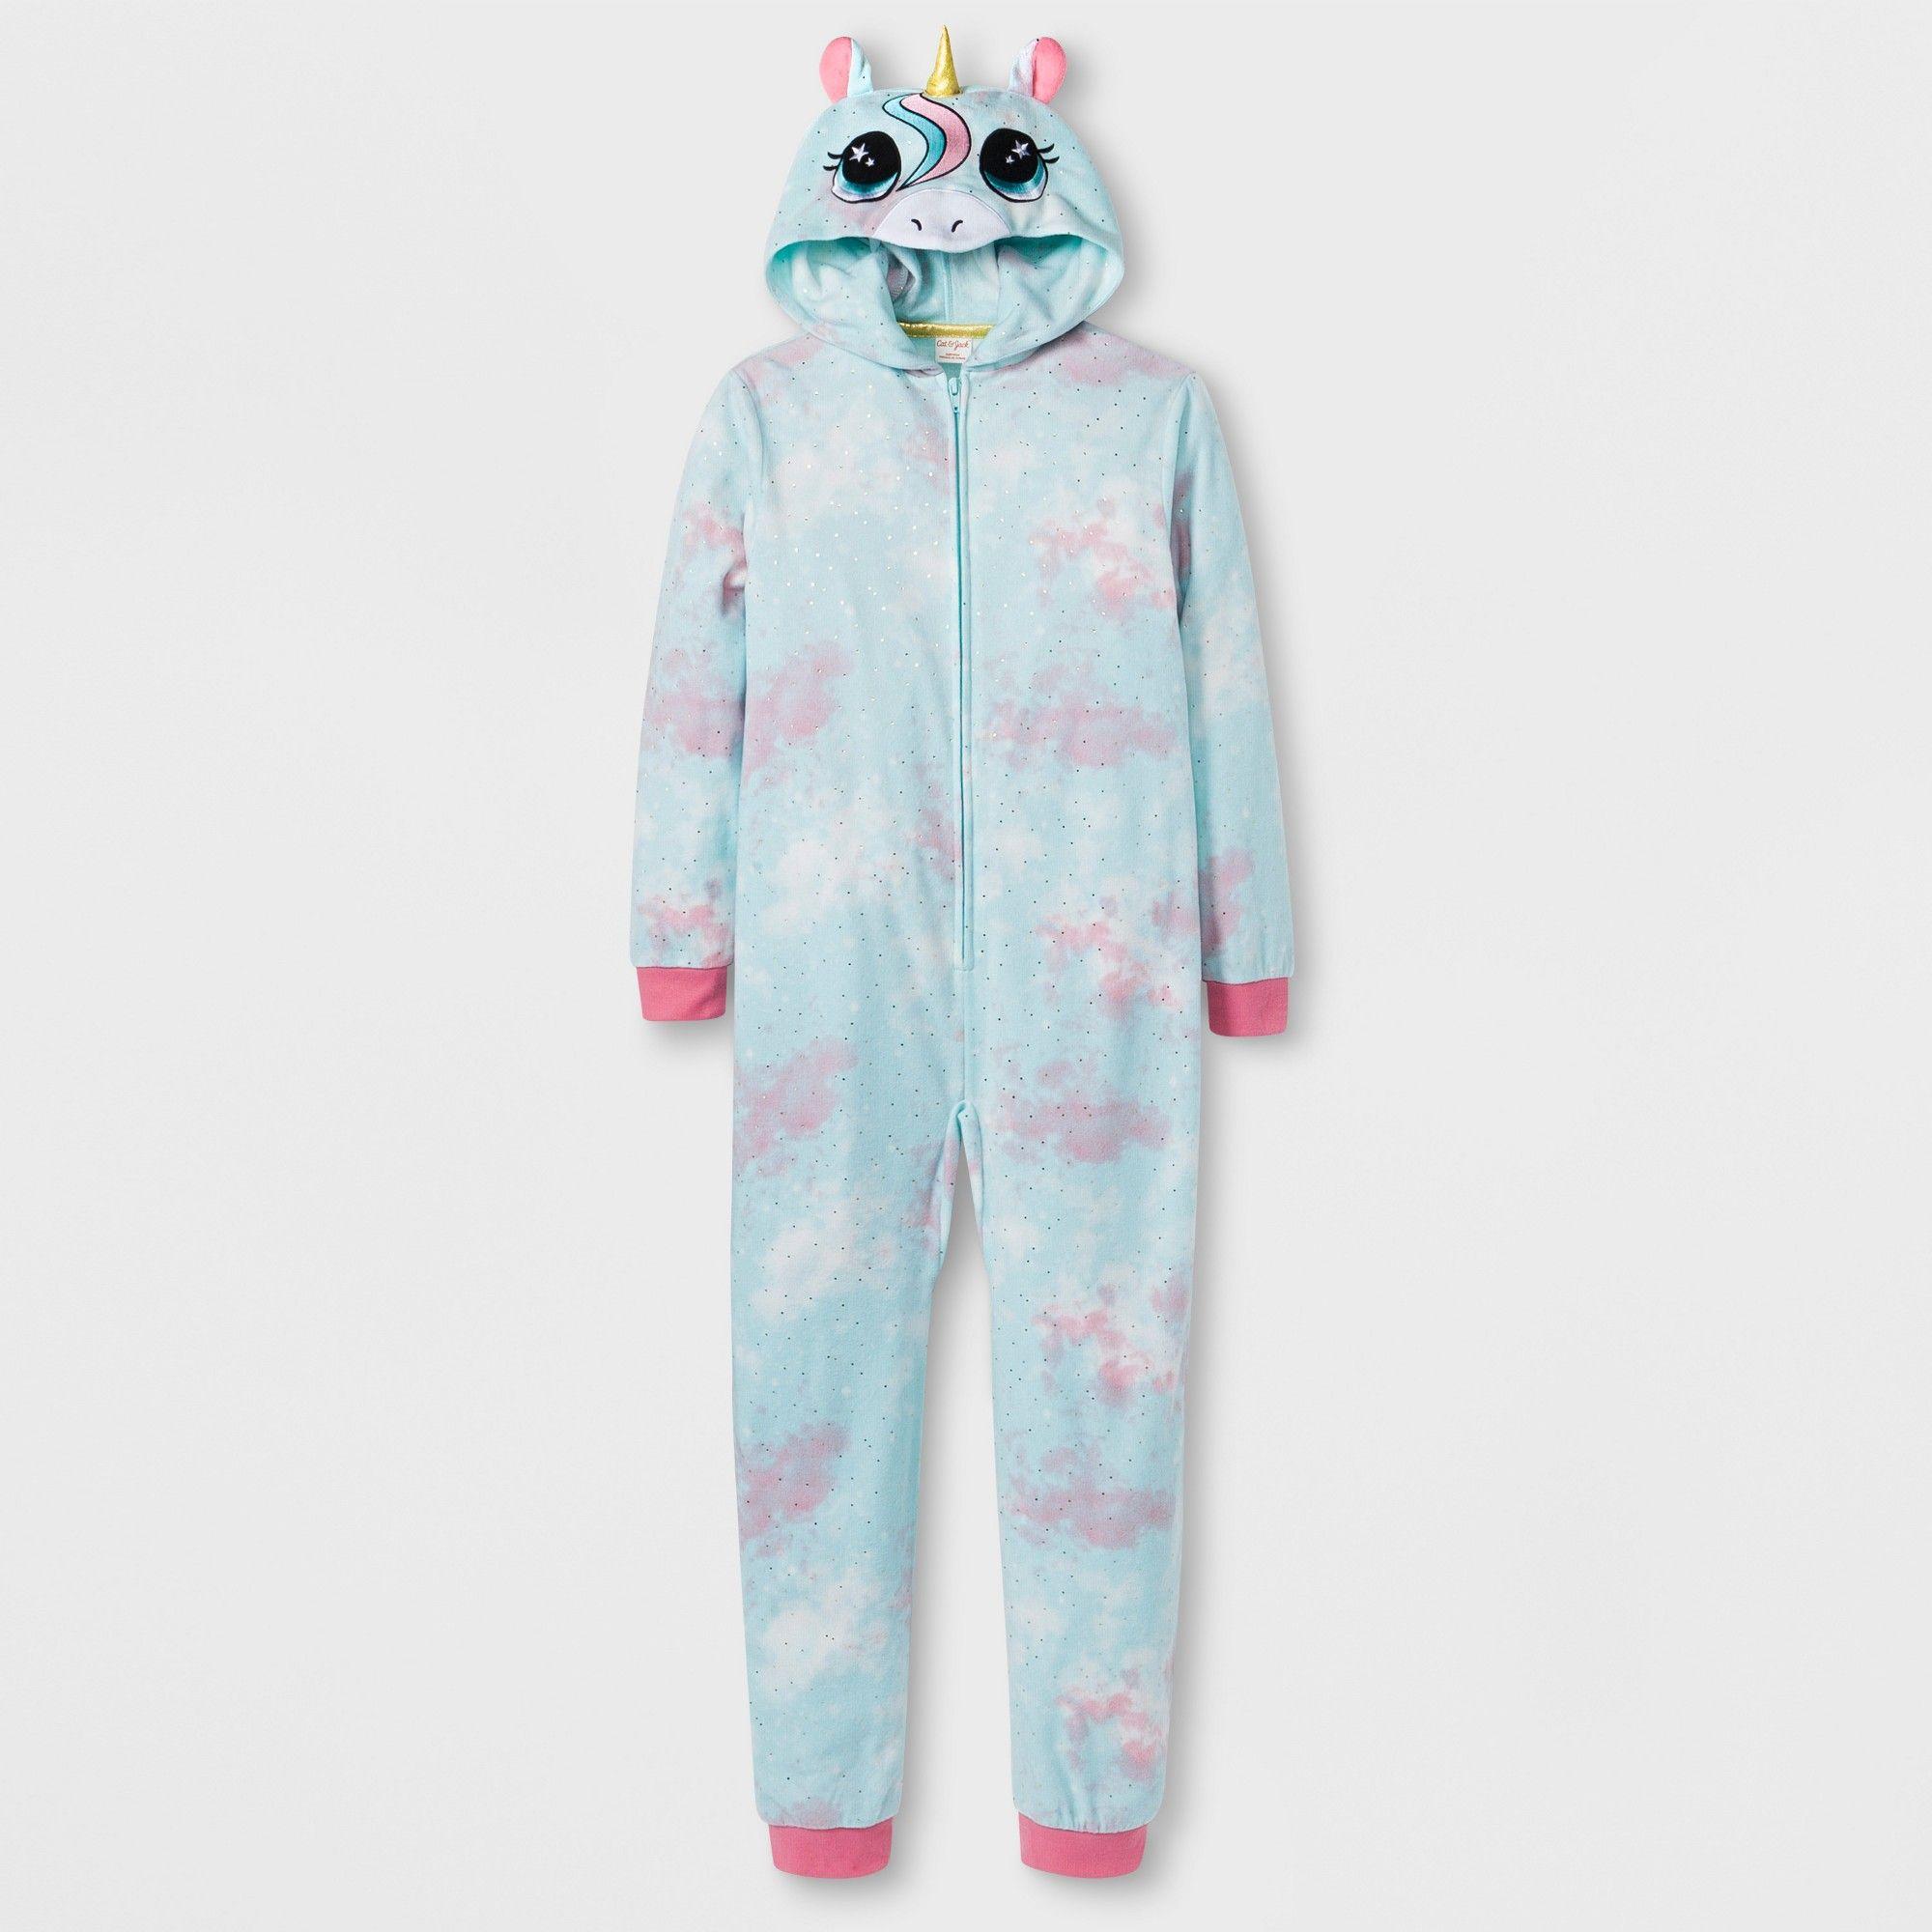 4e8f10af0 Girls  Unicorn Graphic Hooded Blanket Sleeper - Cat   Jack Blue XS ...